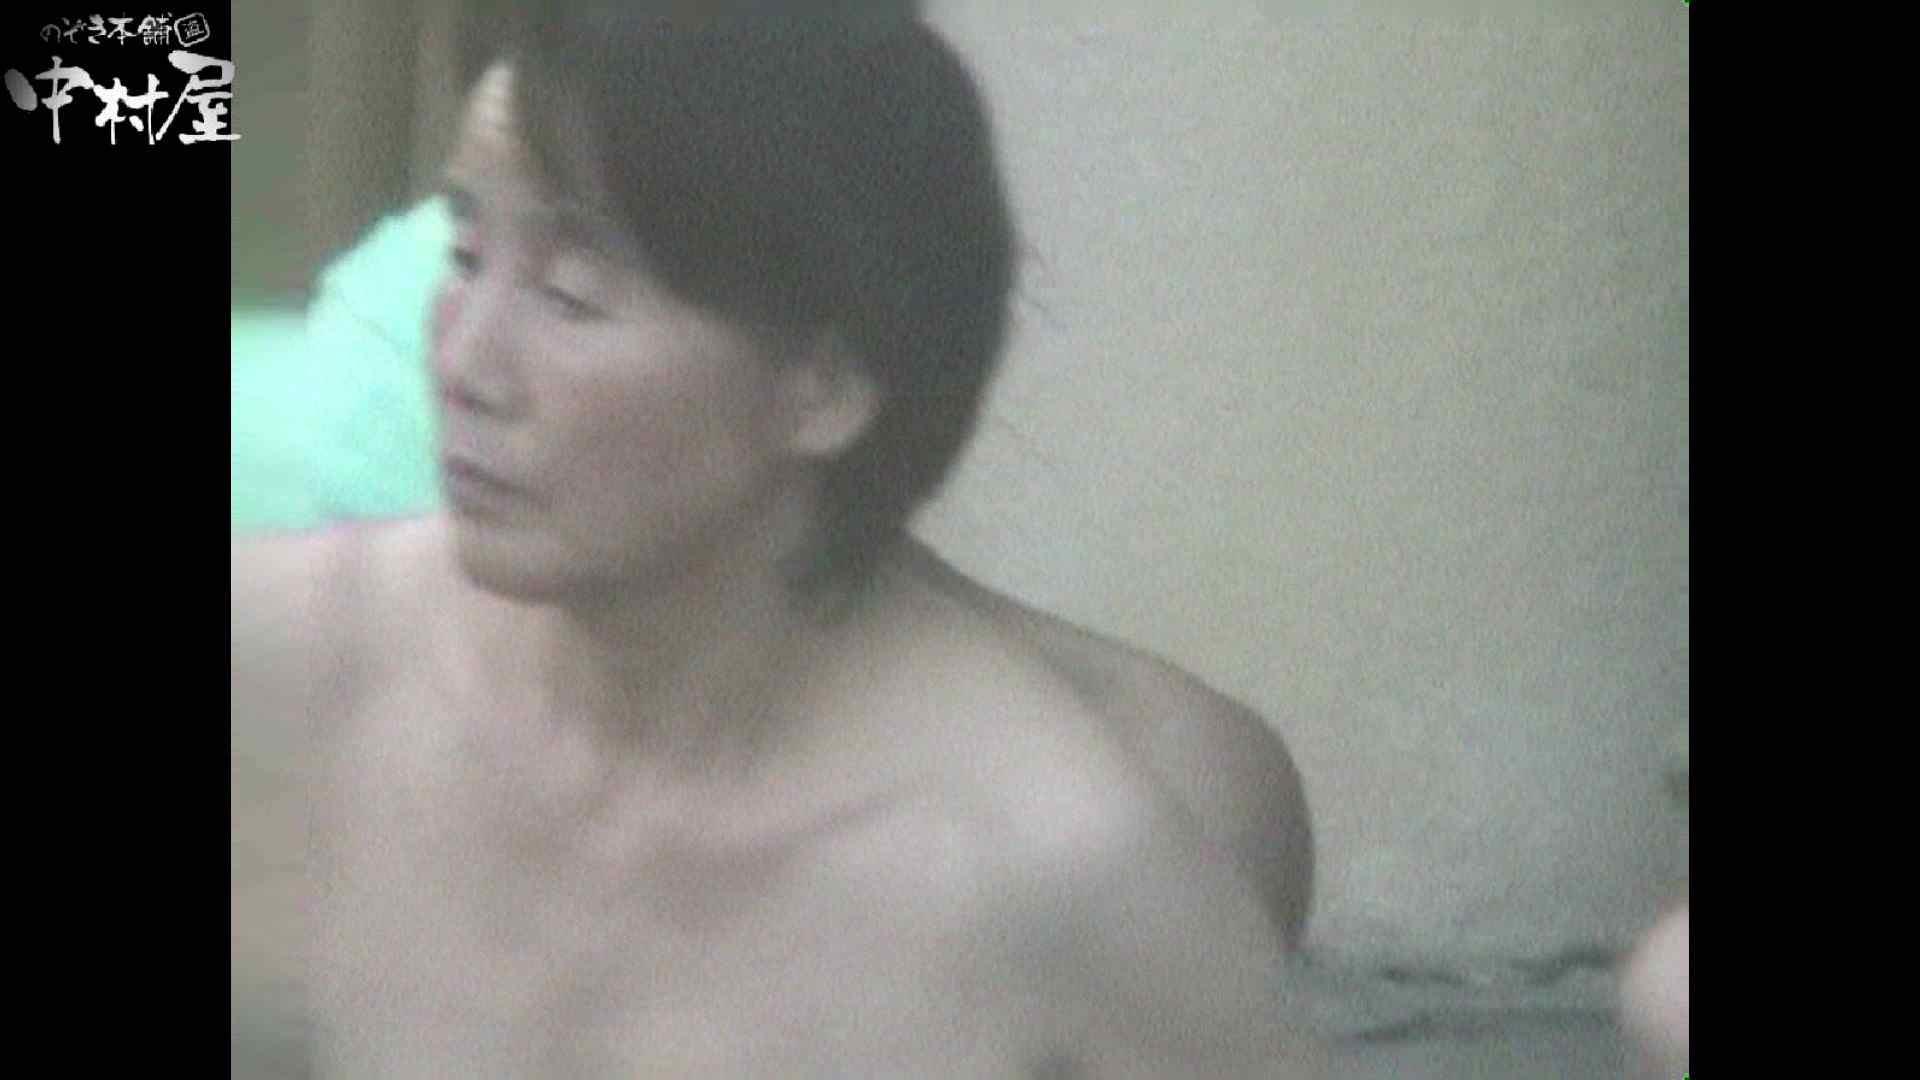 Aquaな露天風呂Vol.931 OLセックス 盗撮オマンコ無修正動画無料 67画像 5